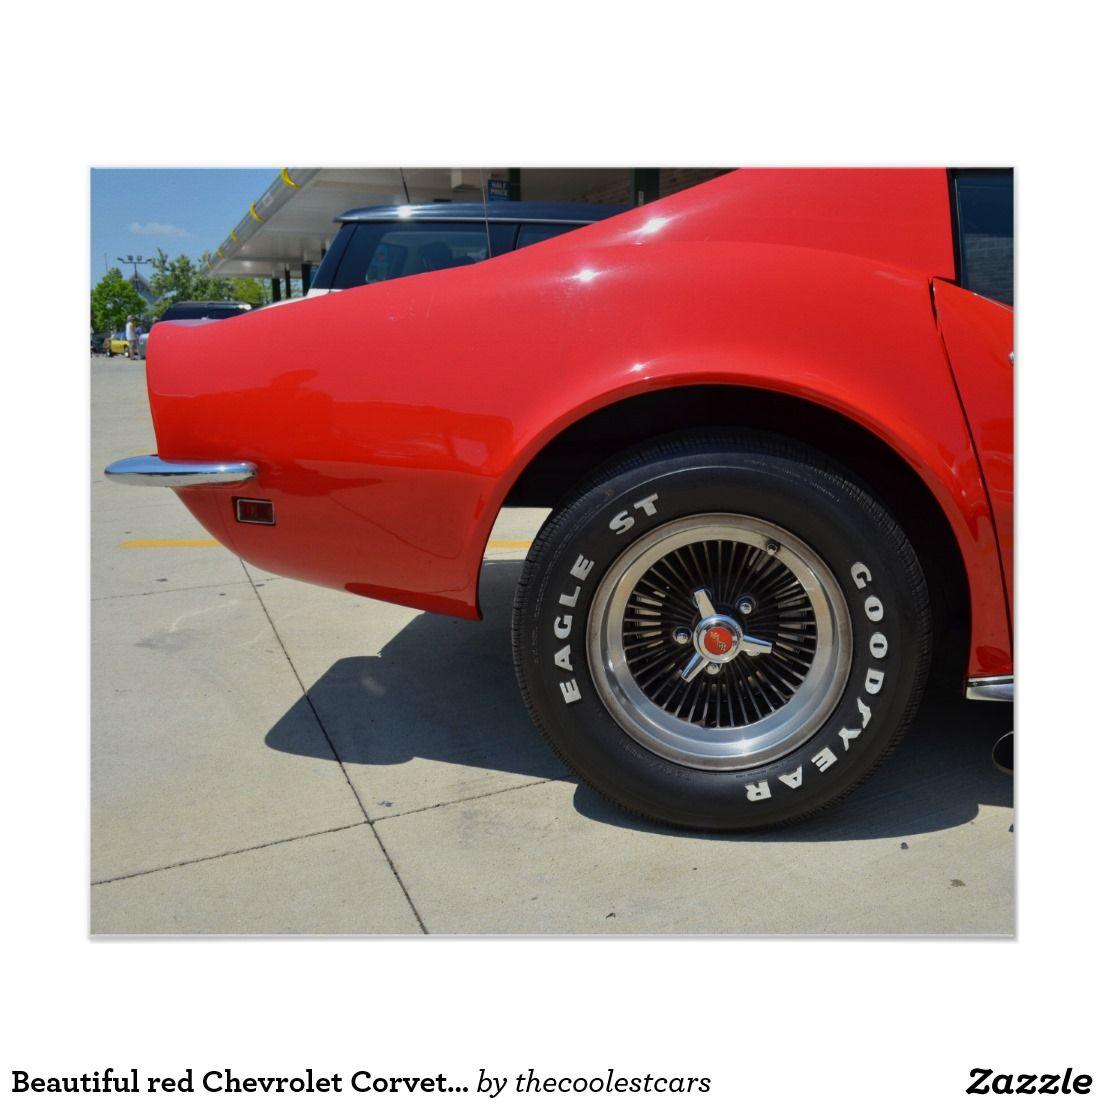 Beautiful red Chevrolet Corvette C3. Poster